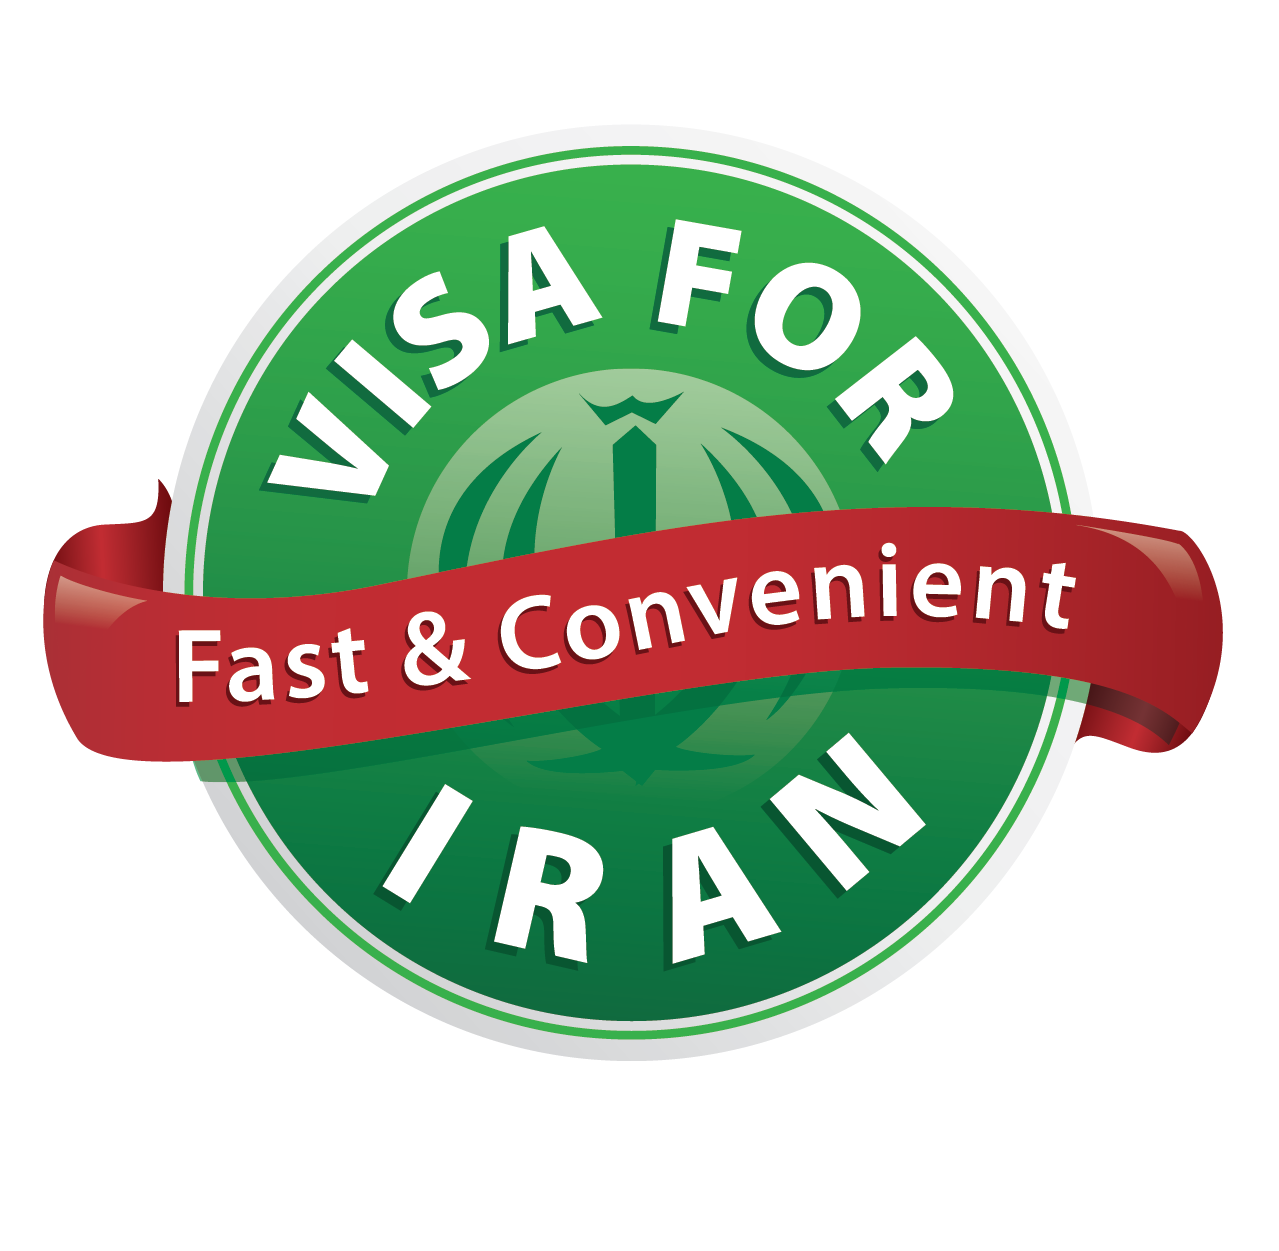 visa for iran logo